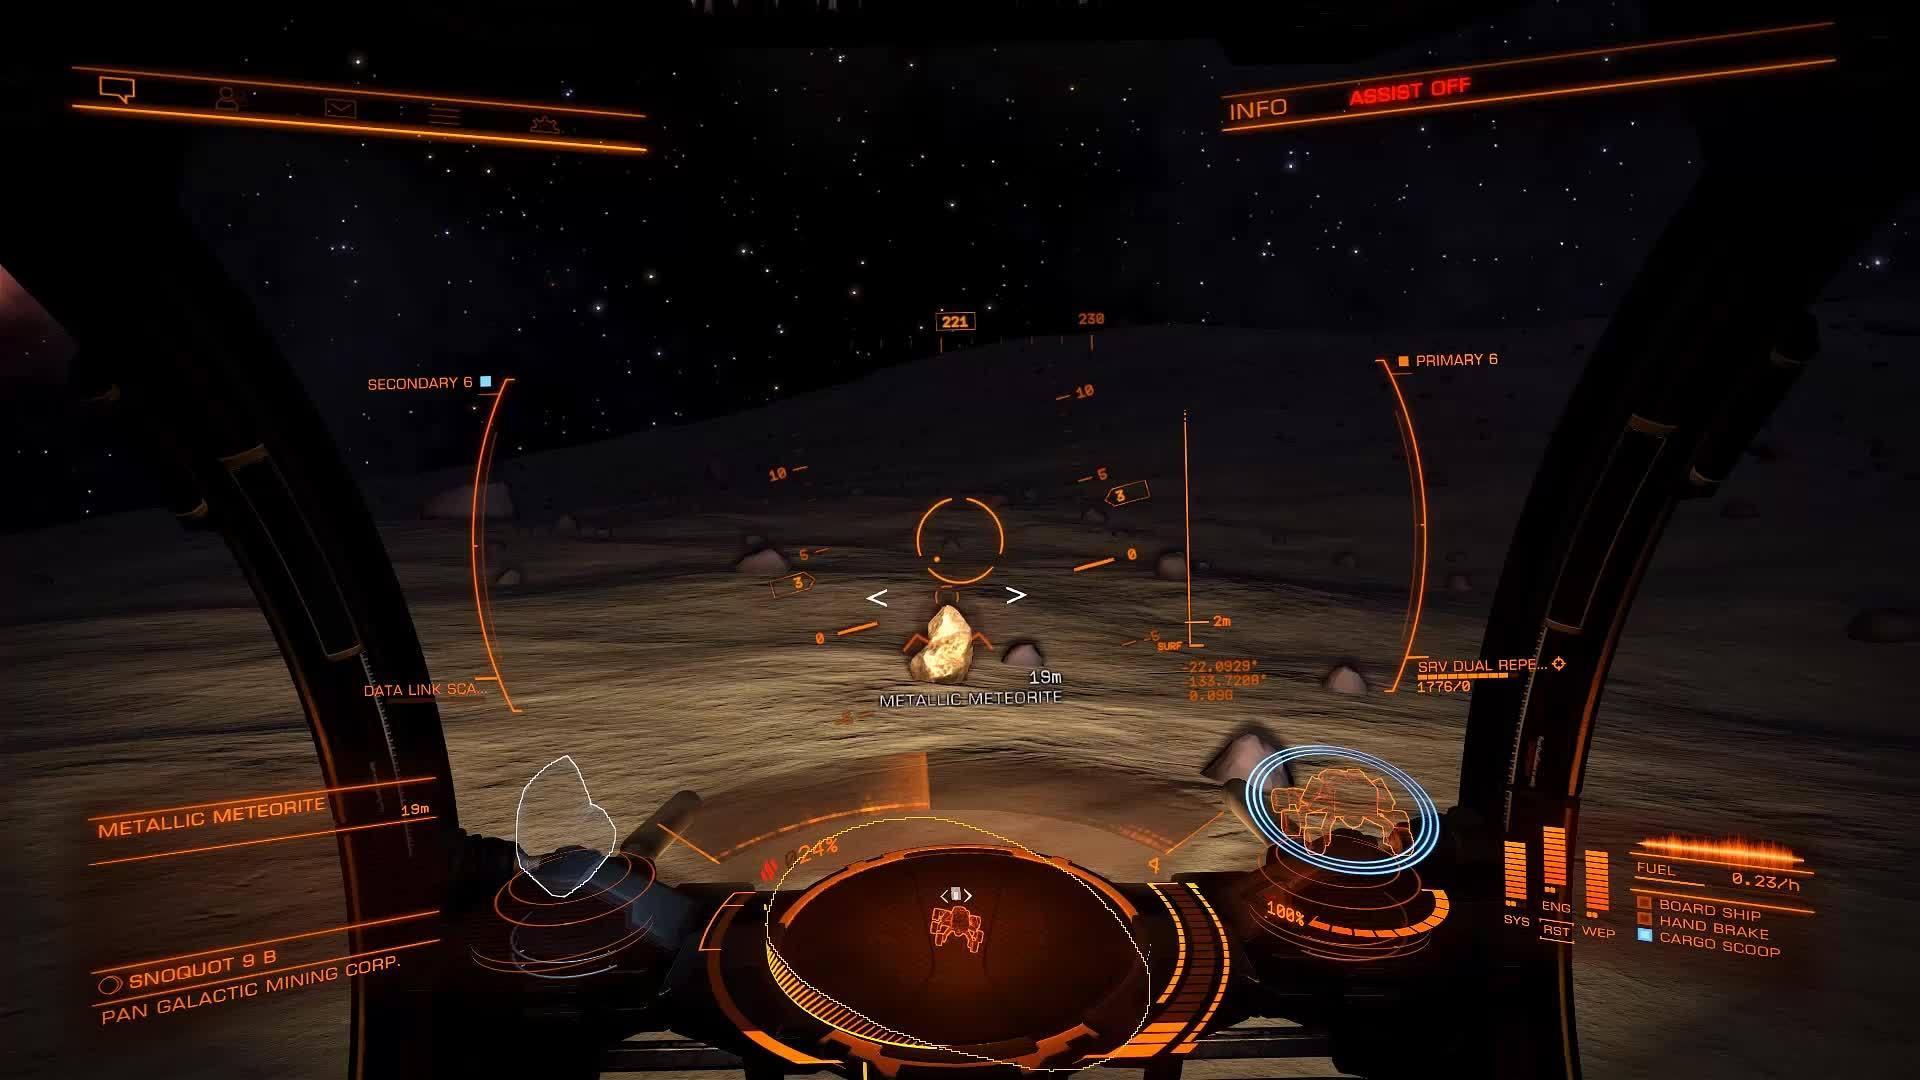 Mining new materials (elite dangerous)